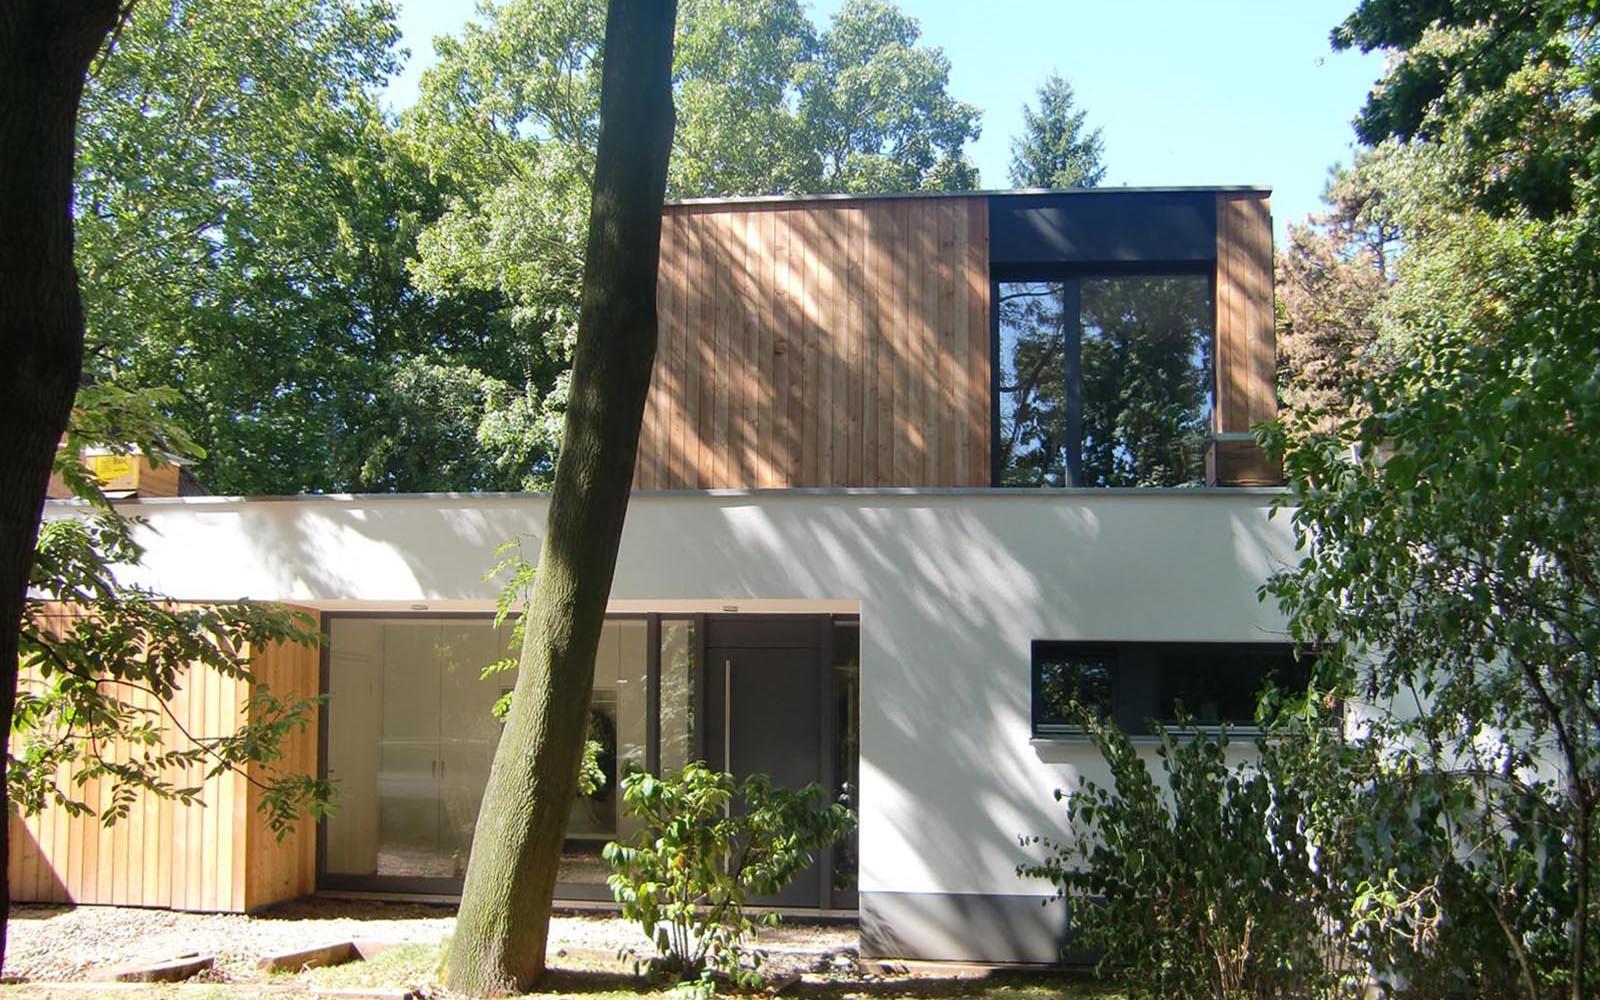 Einfamilienhaus_Koeln_Umbau_Aufstockung_Holzbau_Eingang